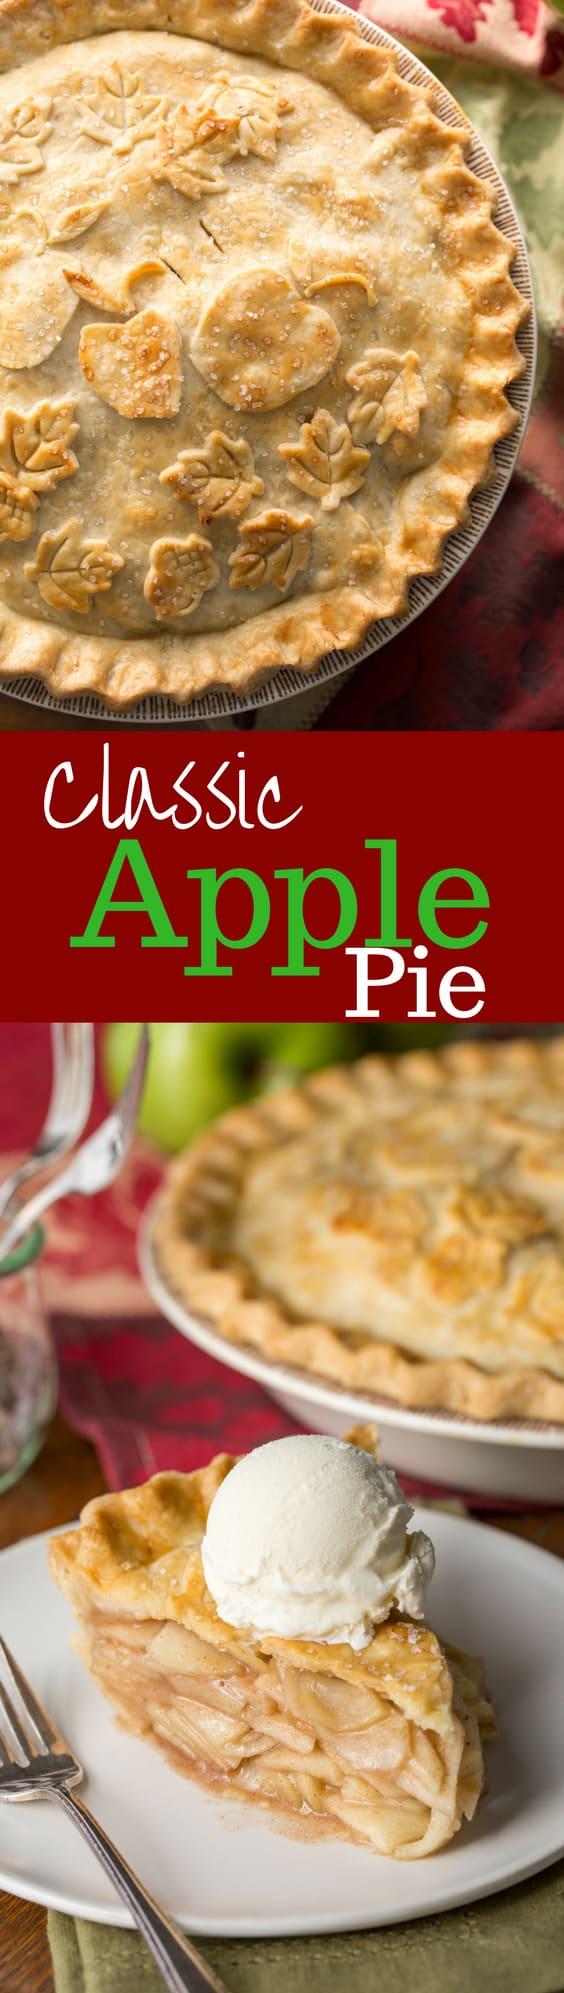 Classic Double Crust Apple Pie Recipe - Saving Room for ...